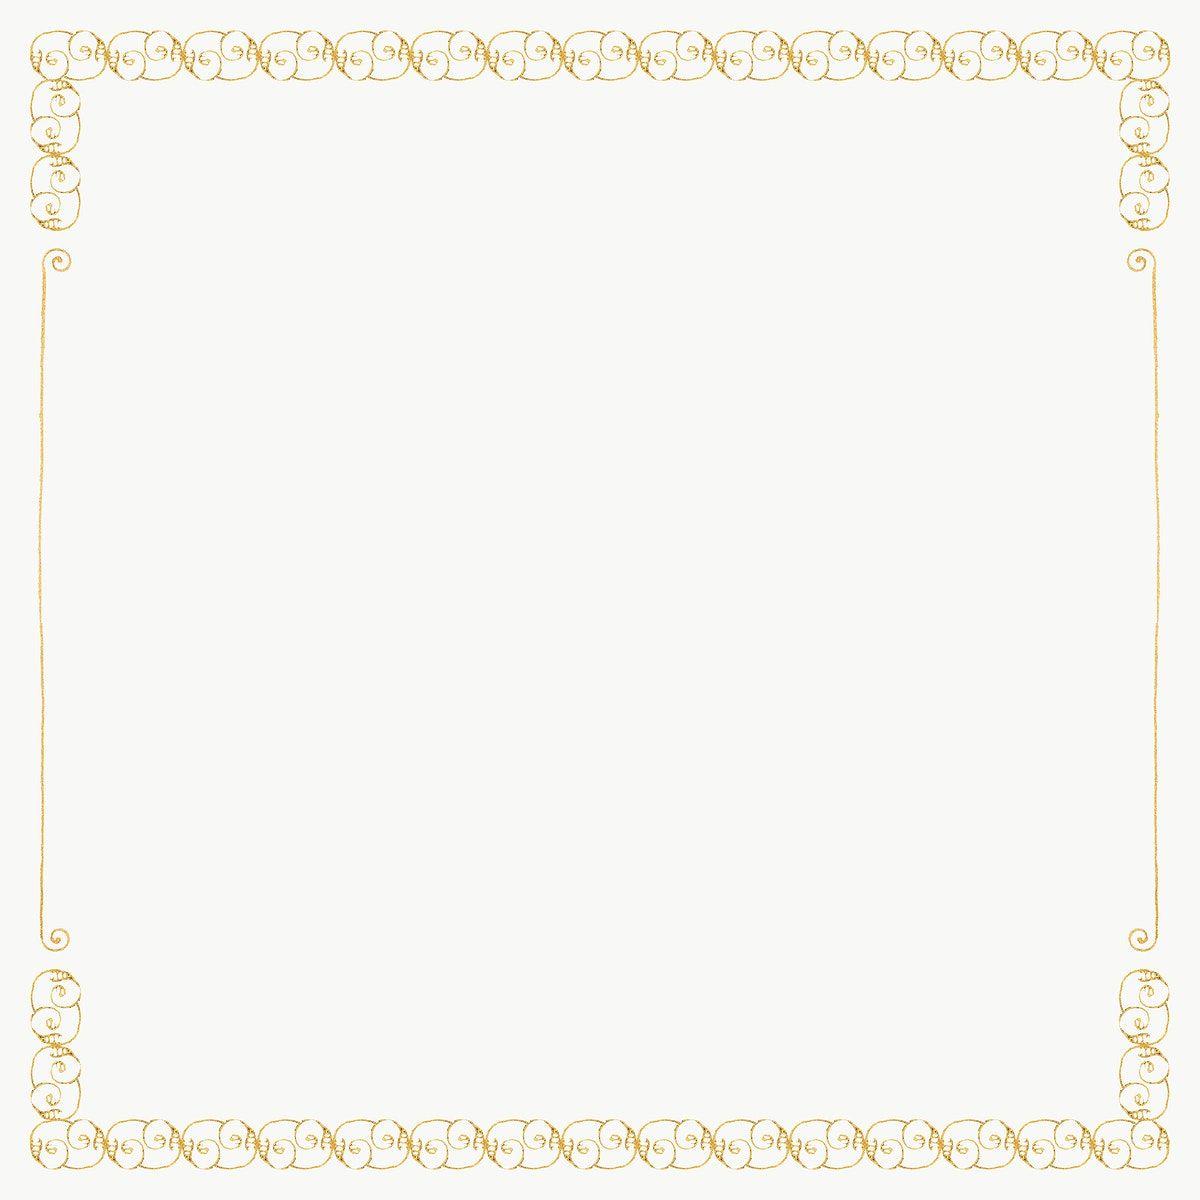 Download Premium Png Of Gold Filigree Frame Border Png 2644986 Gold Filigree Free Illustrations Filigree